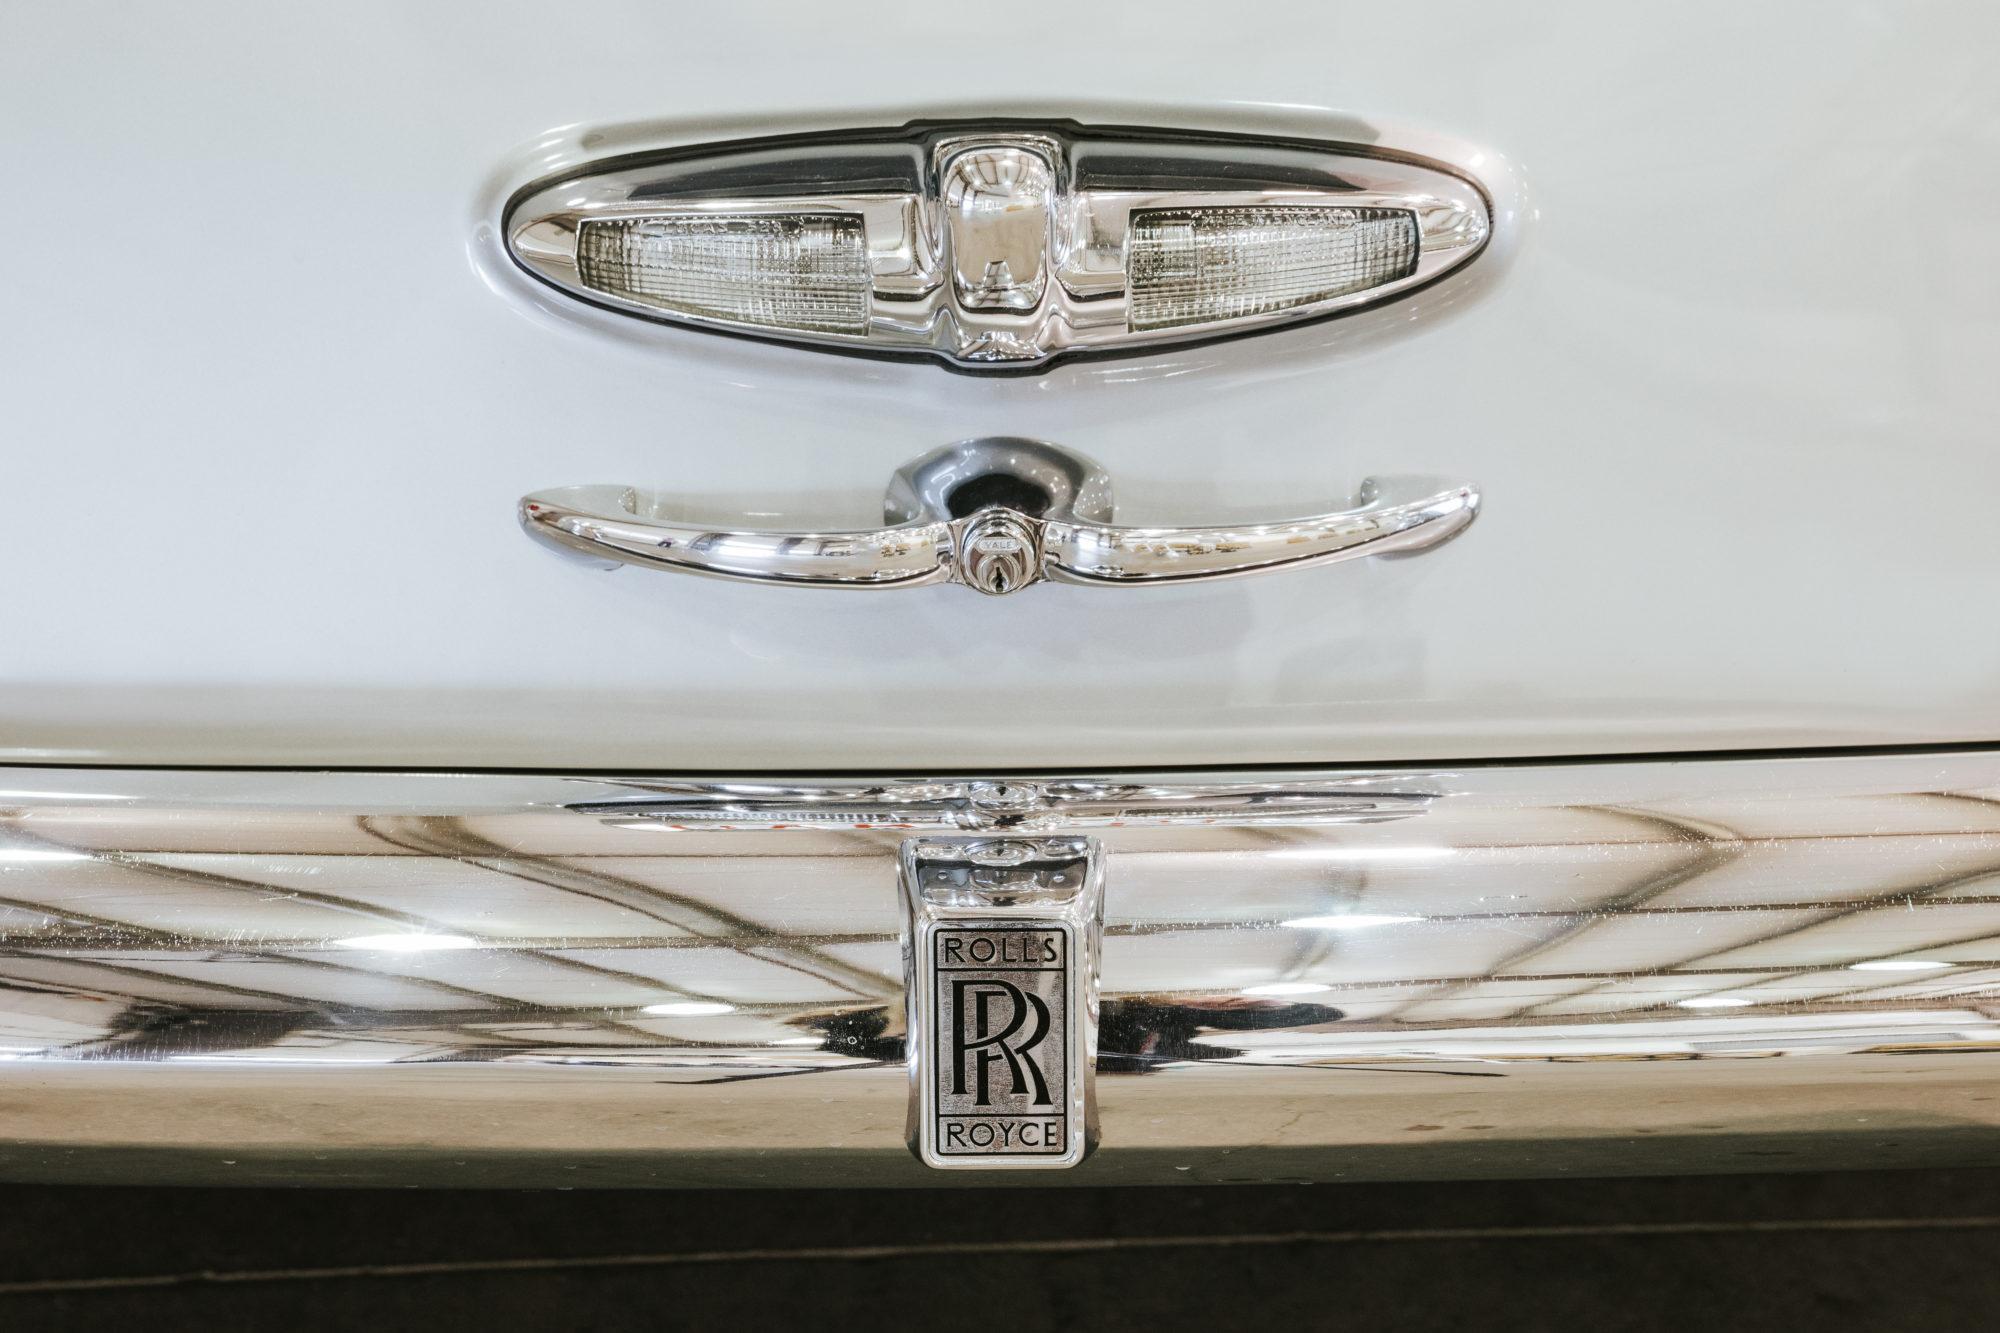 1965 Rolls Royce Silver Cloud Iii Regent Classic Cars